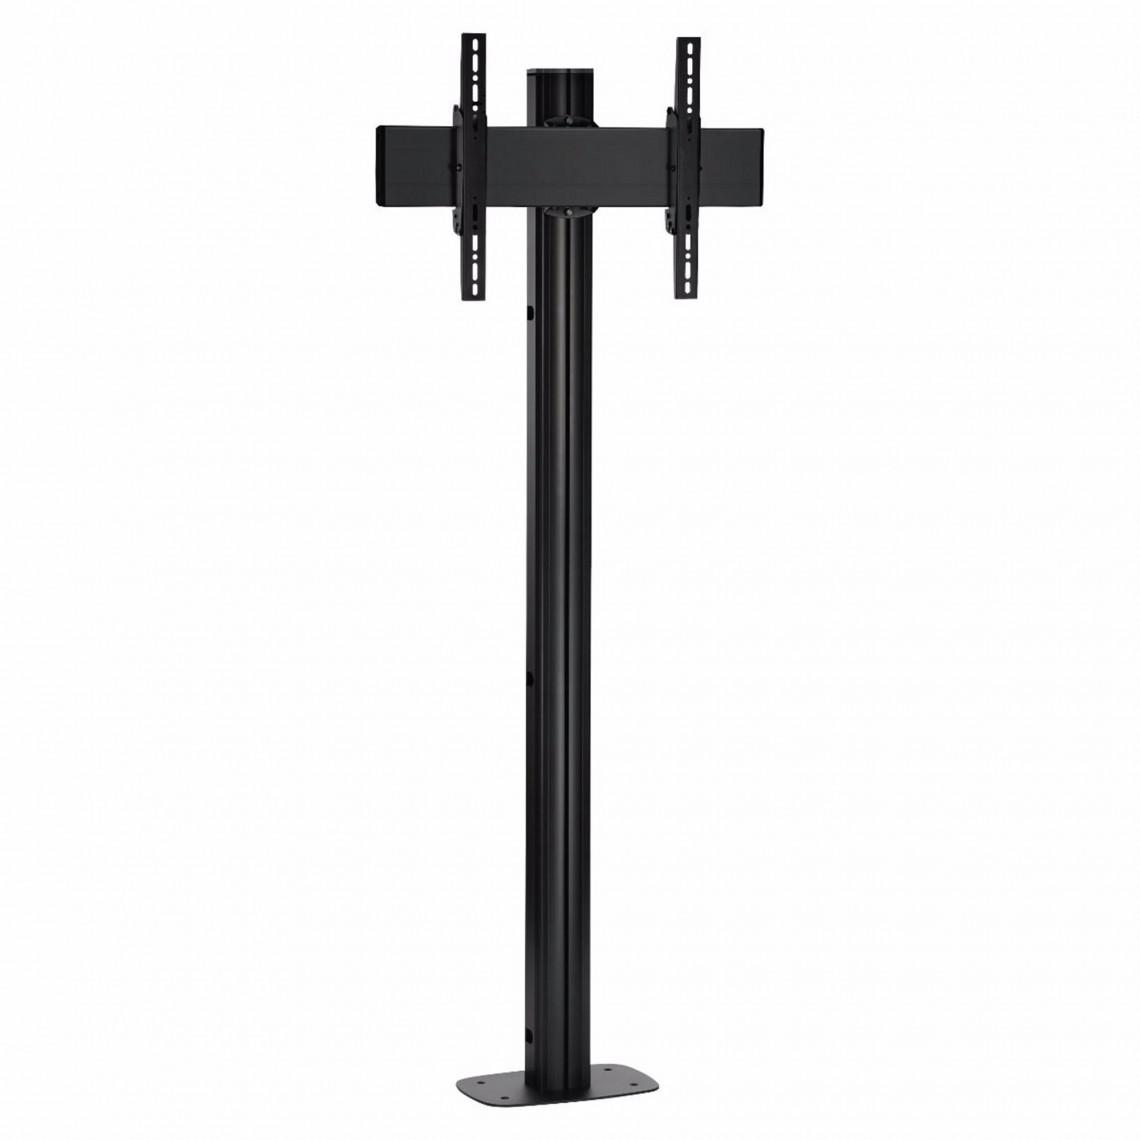 Vogel's Pro FM 1844B Floor Stand Fixed 180cm 400x400 Black